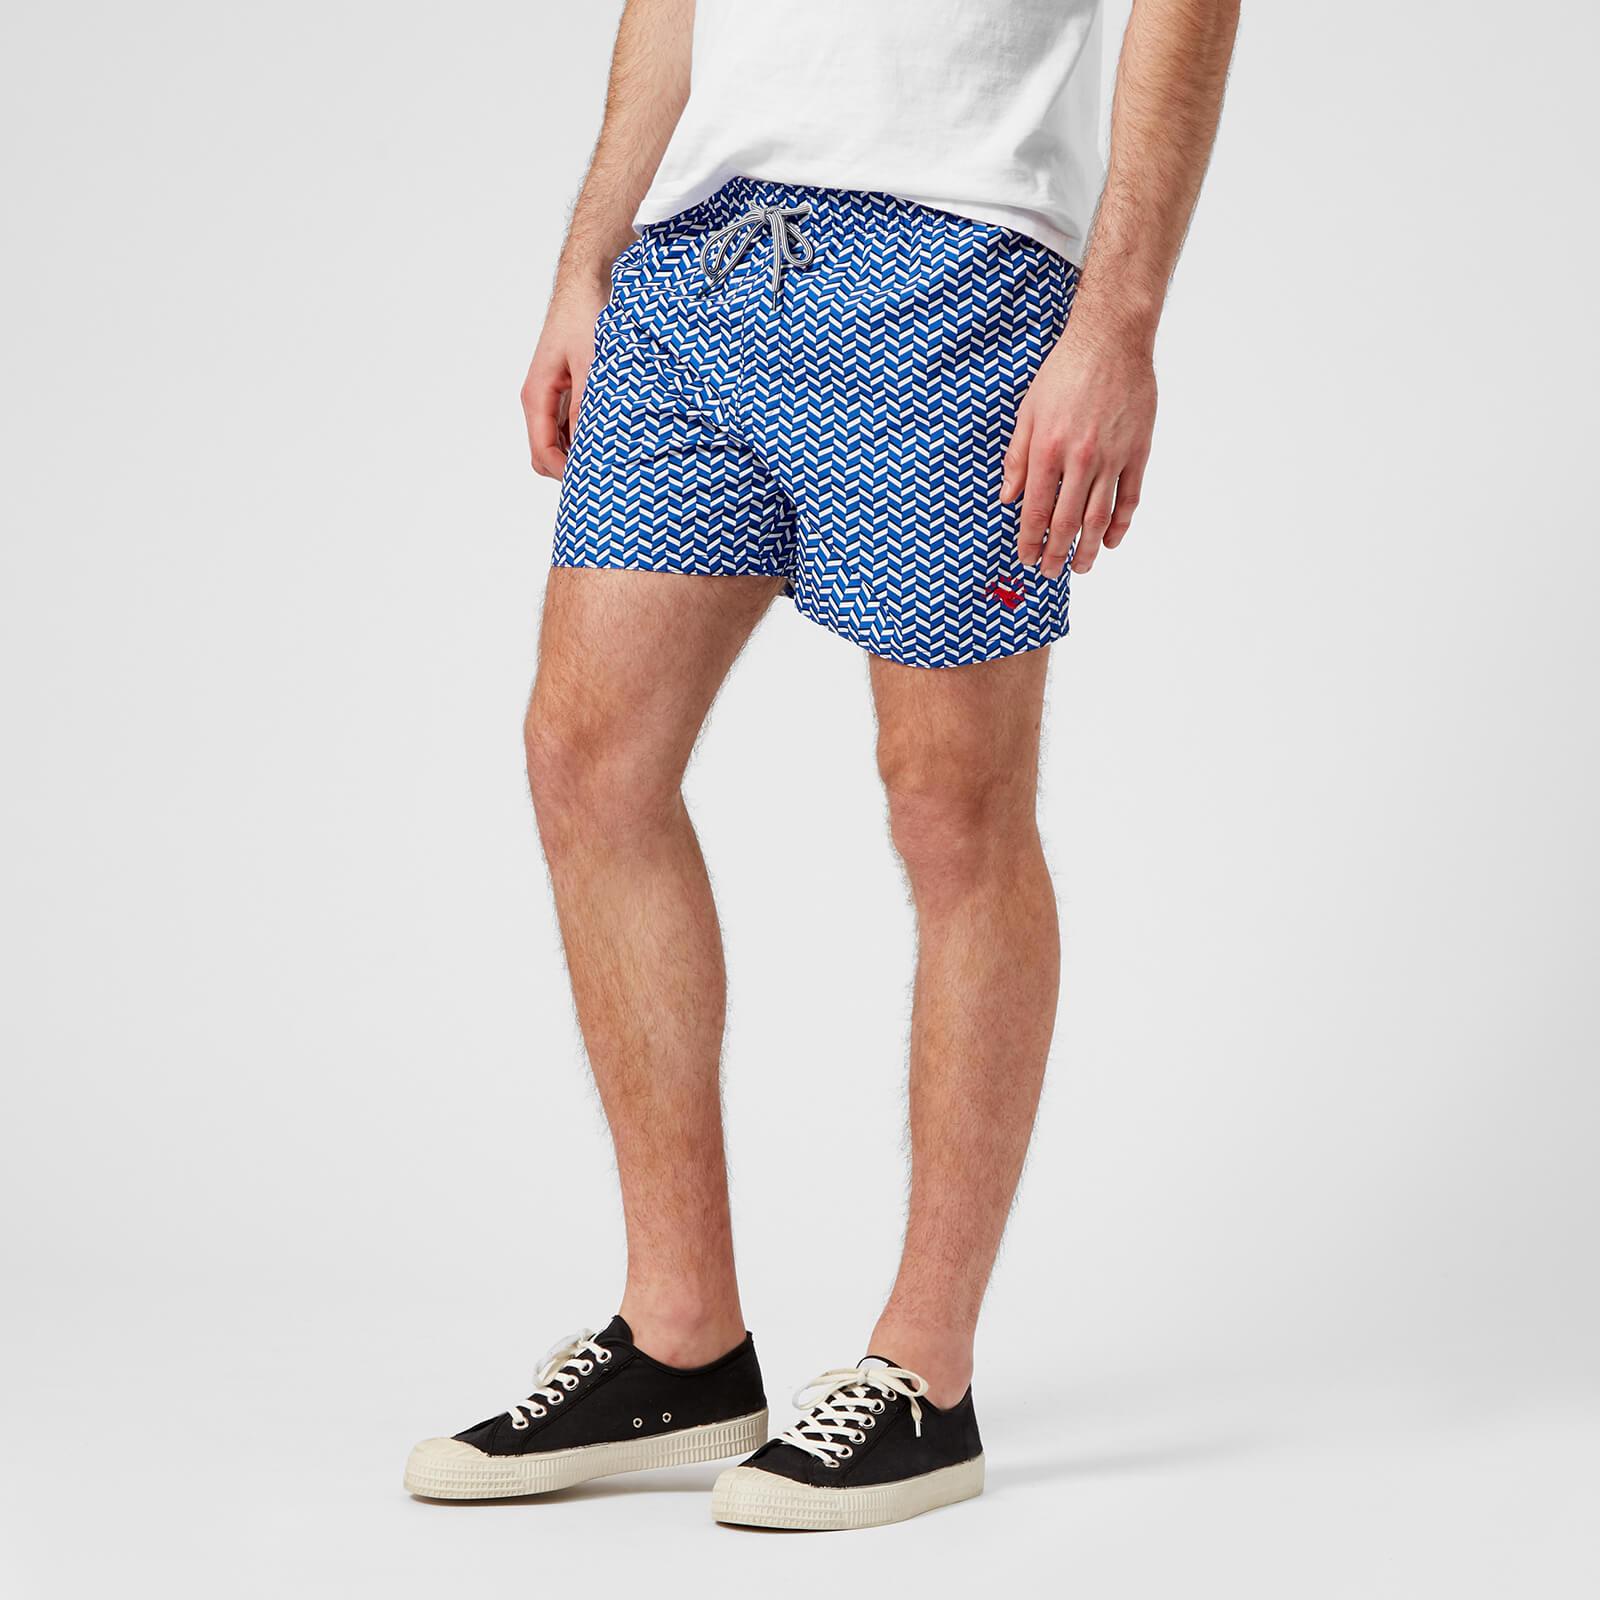 9915644347 Ted Baker Men's Caven Patterned Swim Shorts - Blue Mens Underwear |  TheHut.com